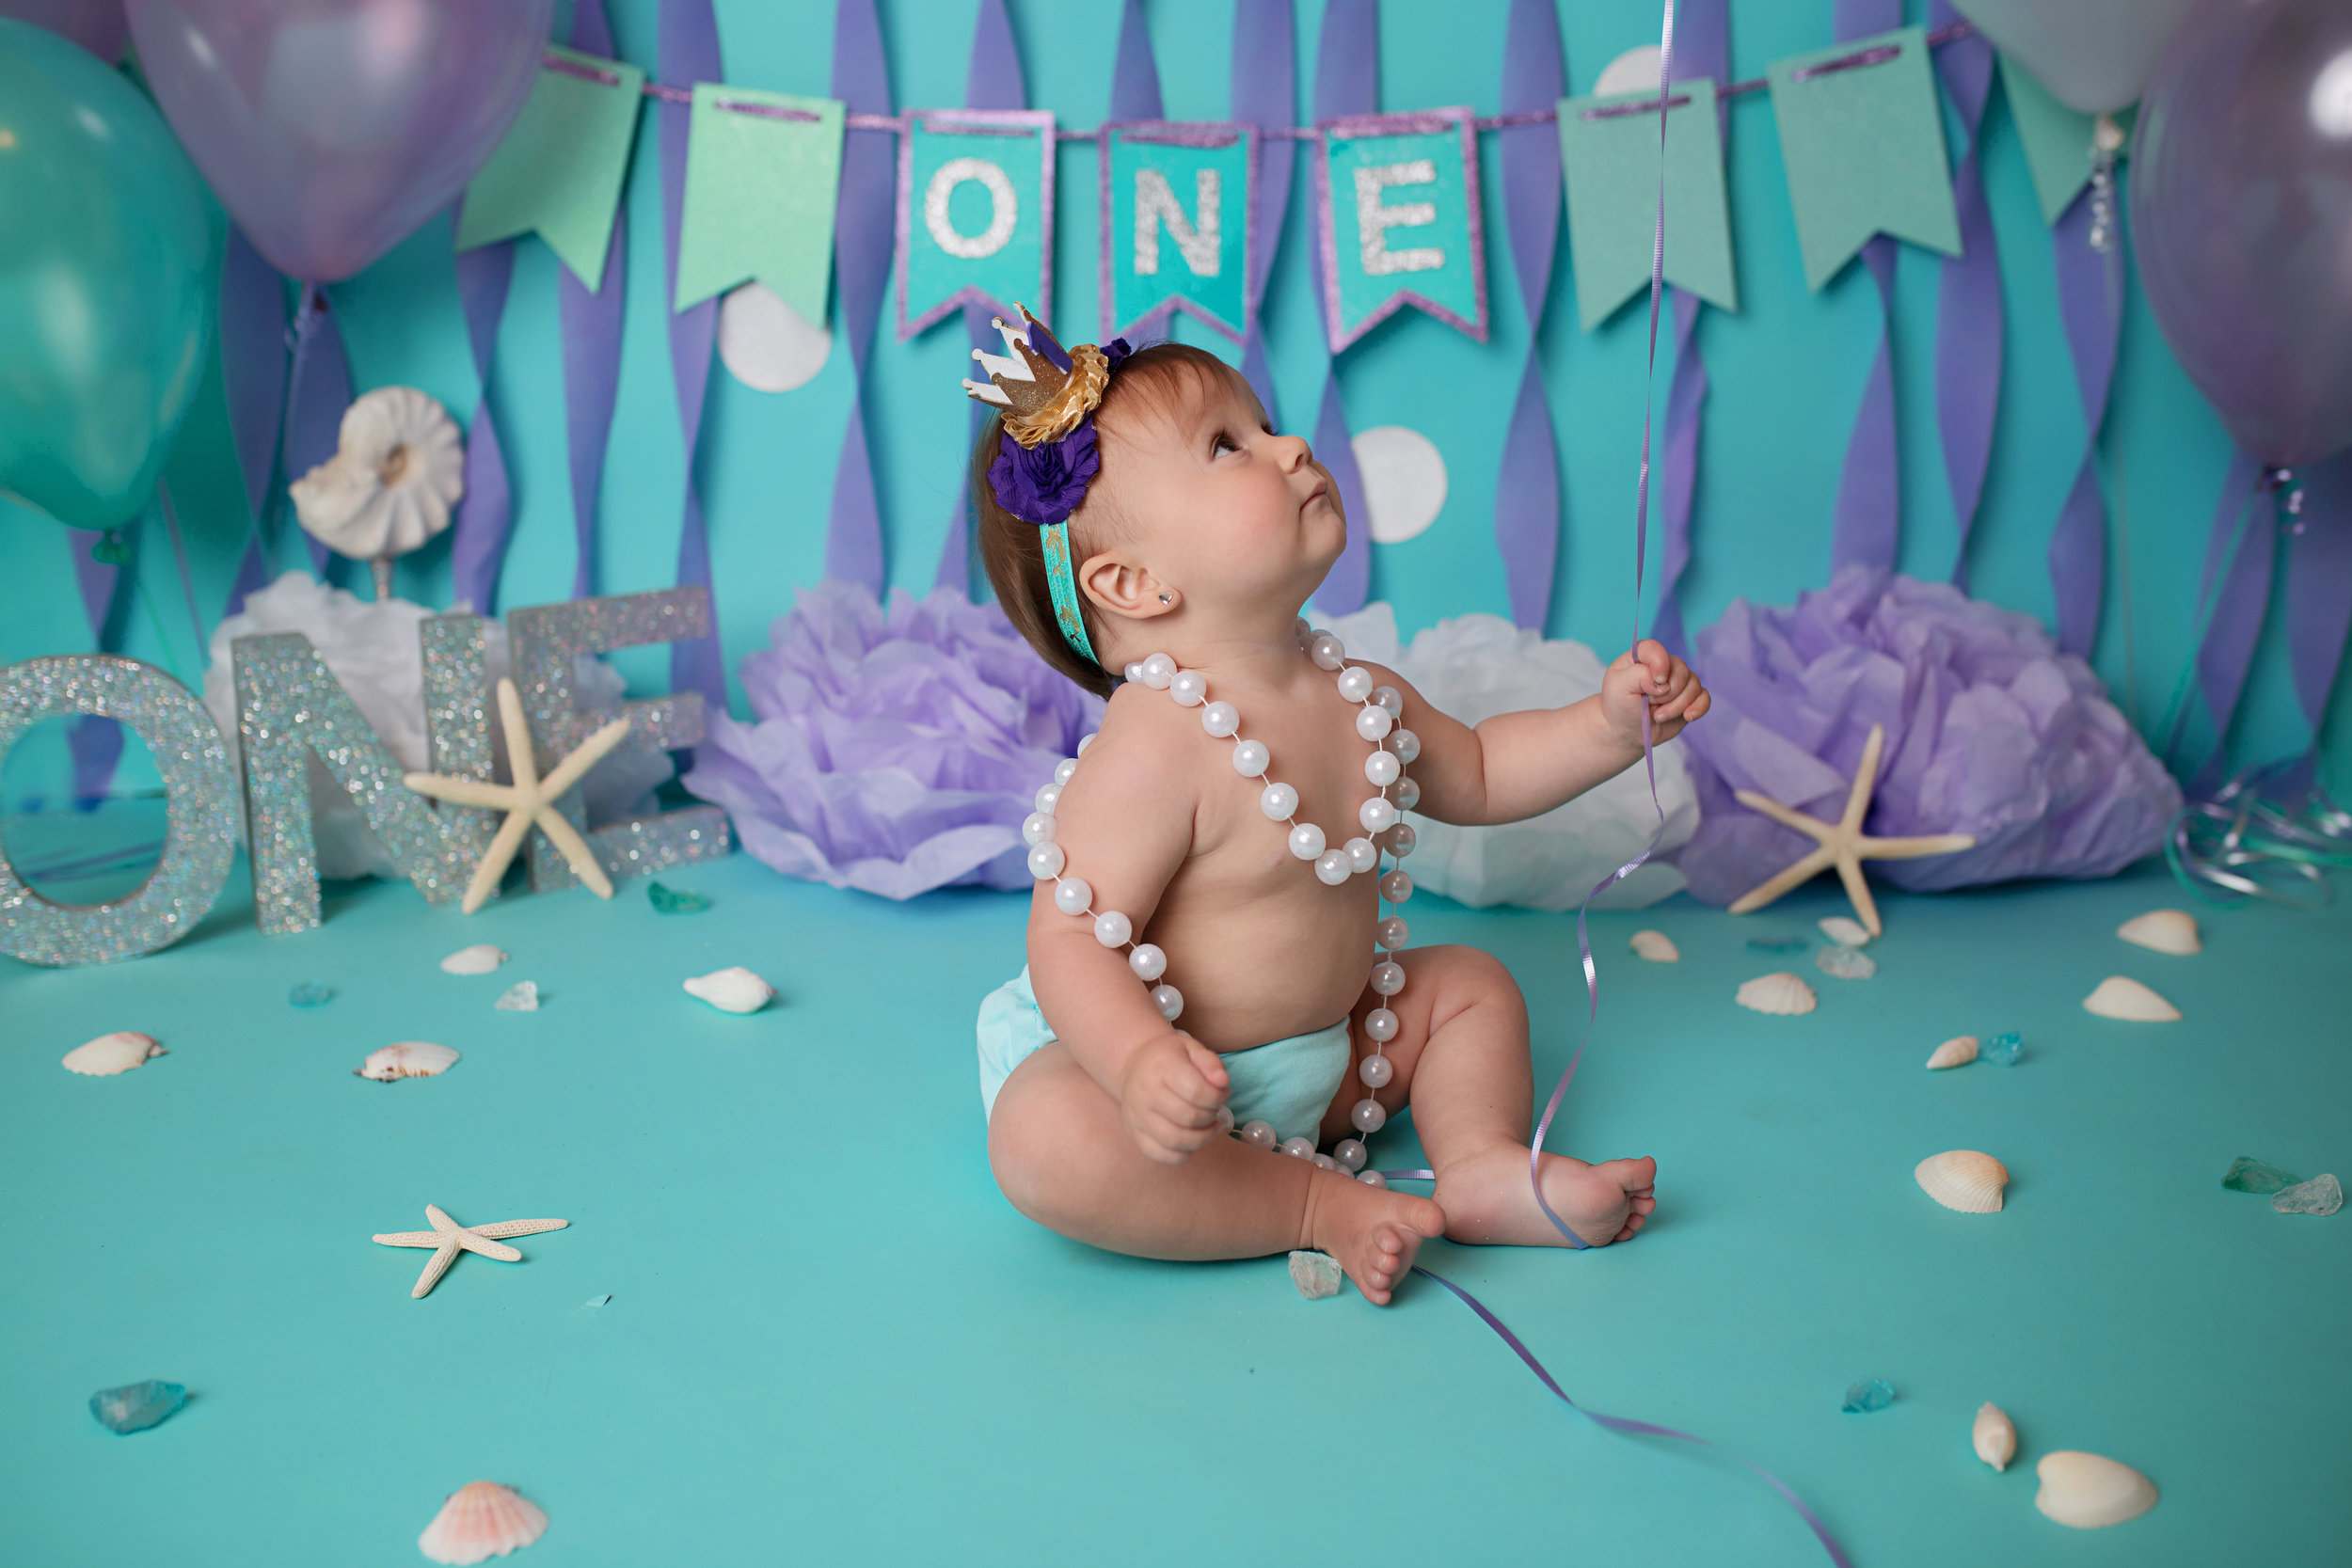 anchorage-cake-smash-photography-5.jpg